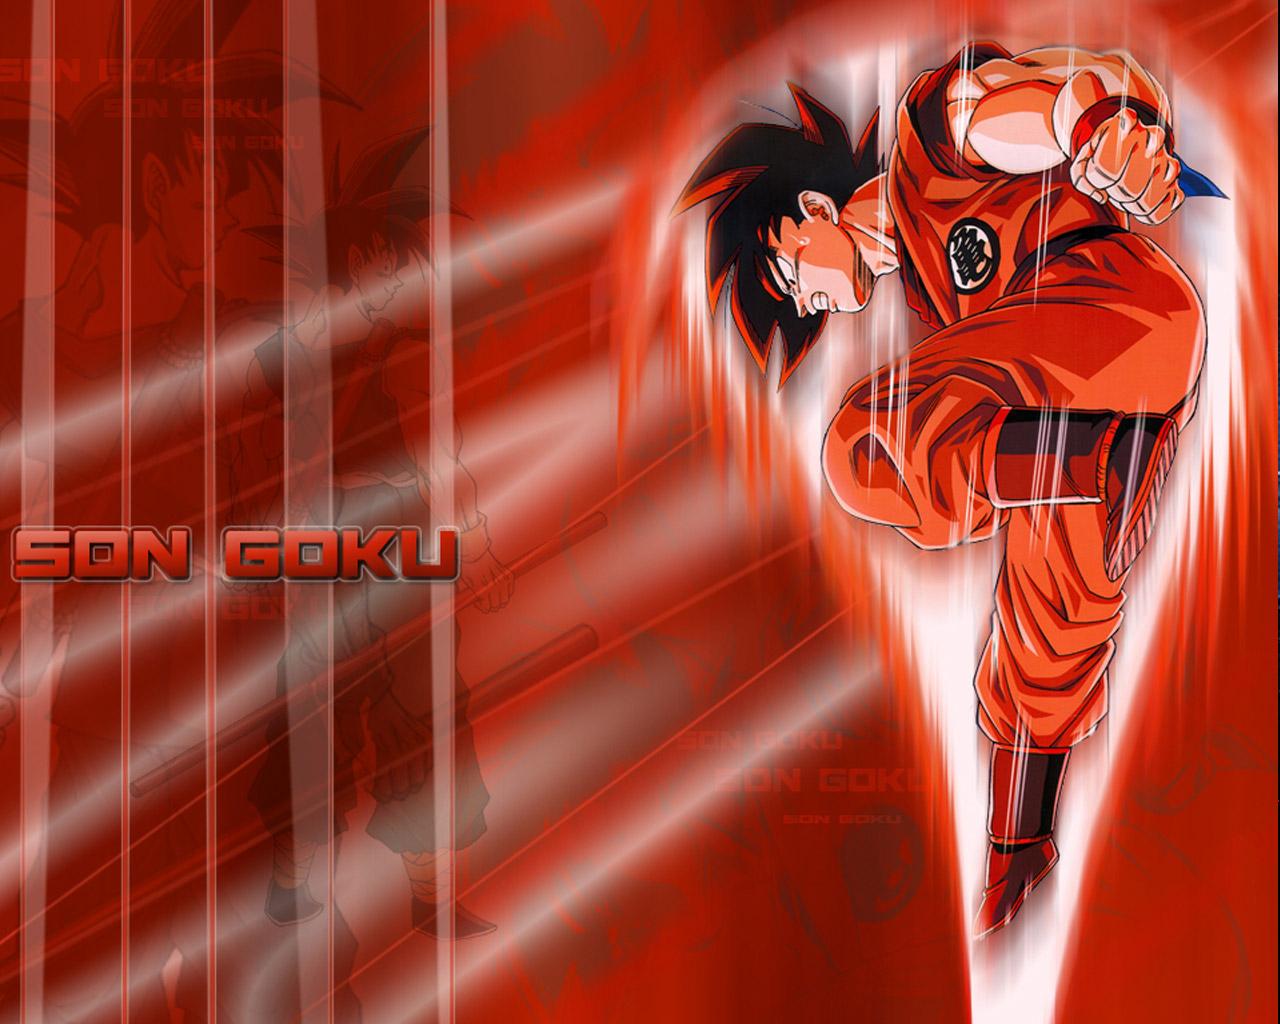 Free Download Goku Goku Wallpaper 25544956 1280x1024 For Your